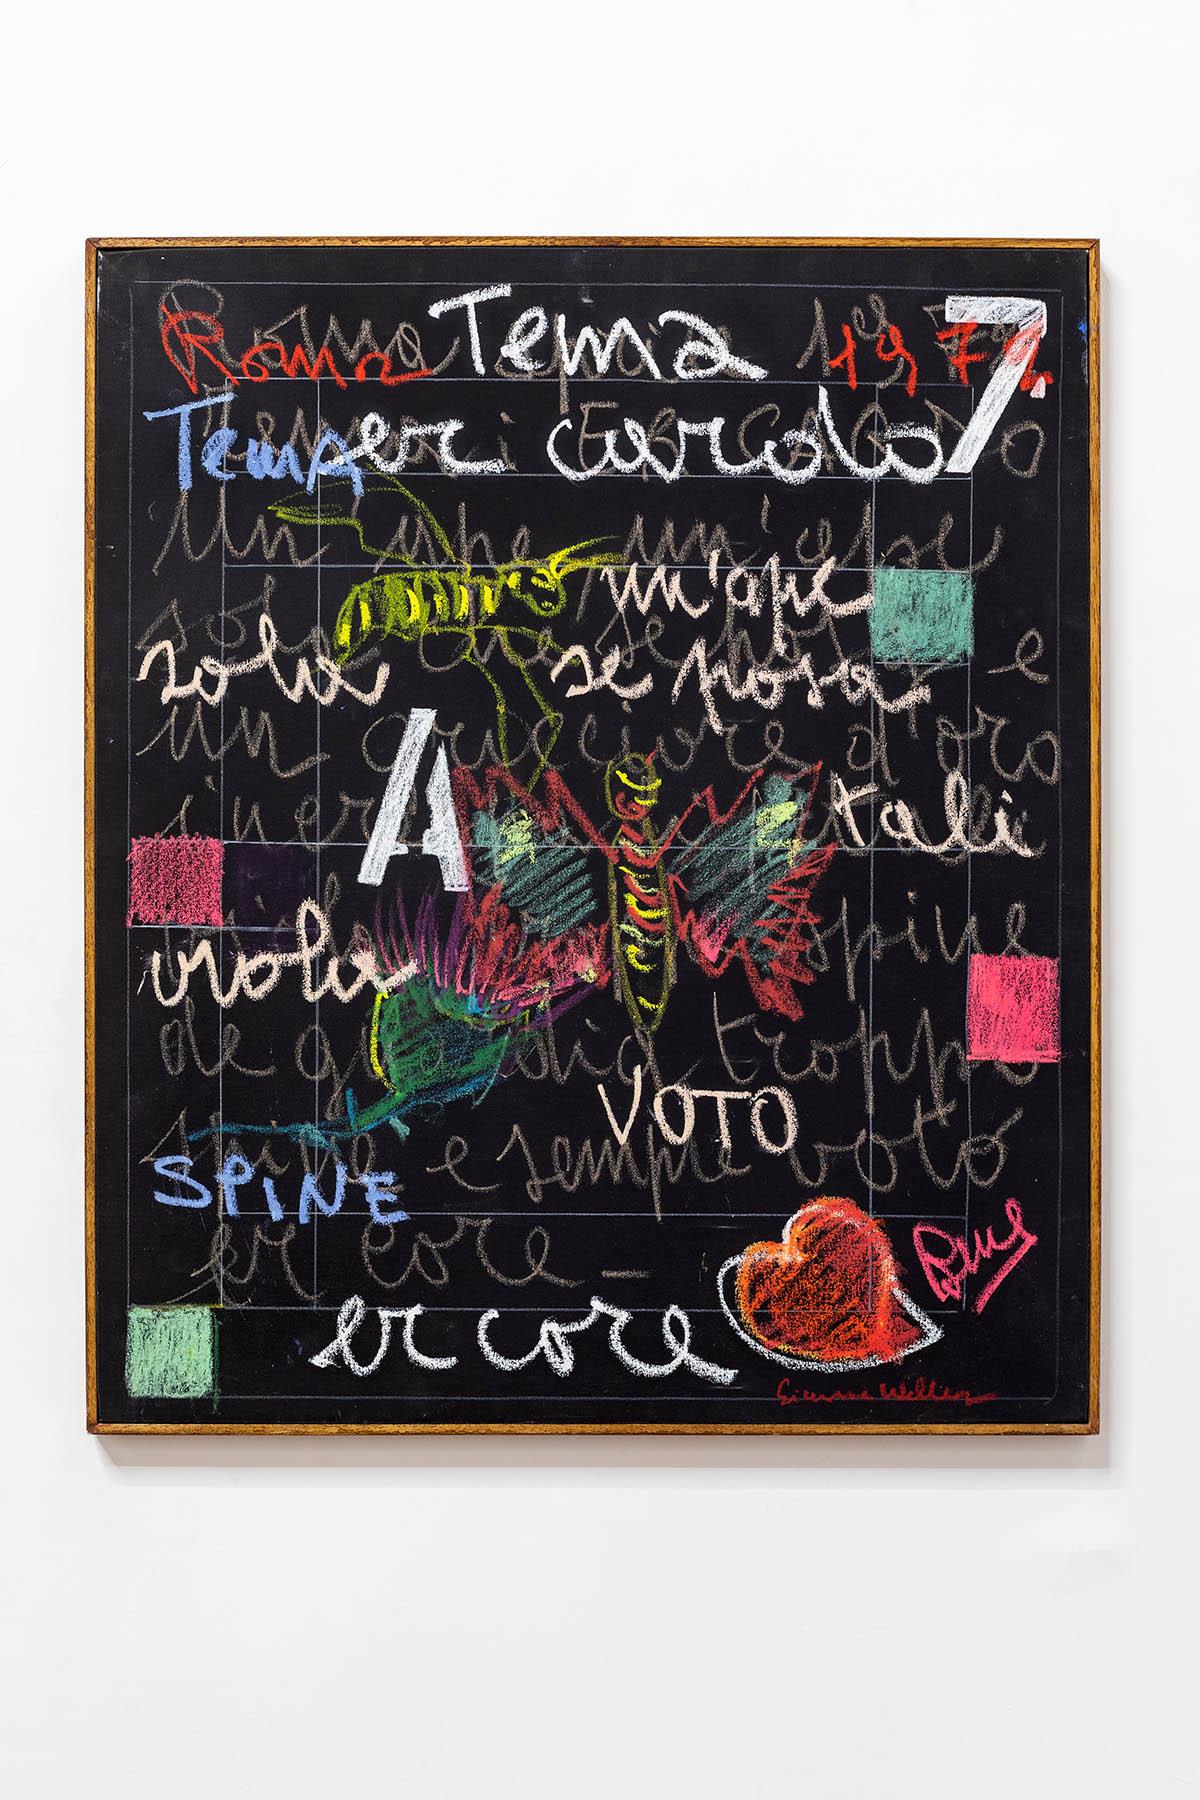 Simona Weller, Er cardo, 1972, pastel on canvas, cm 65,5 x 55,5 (con cornice / framed)